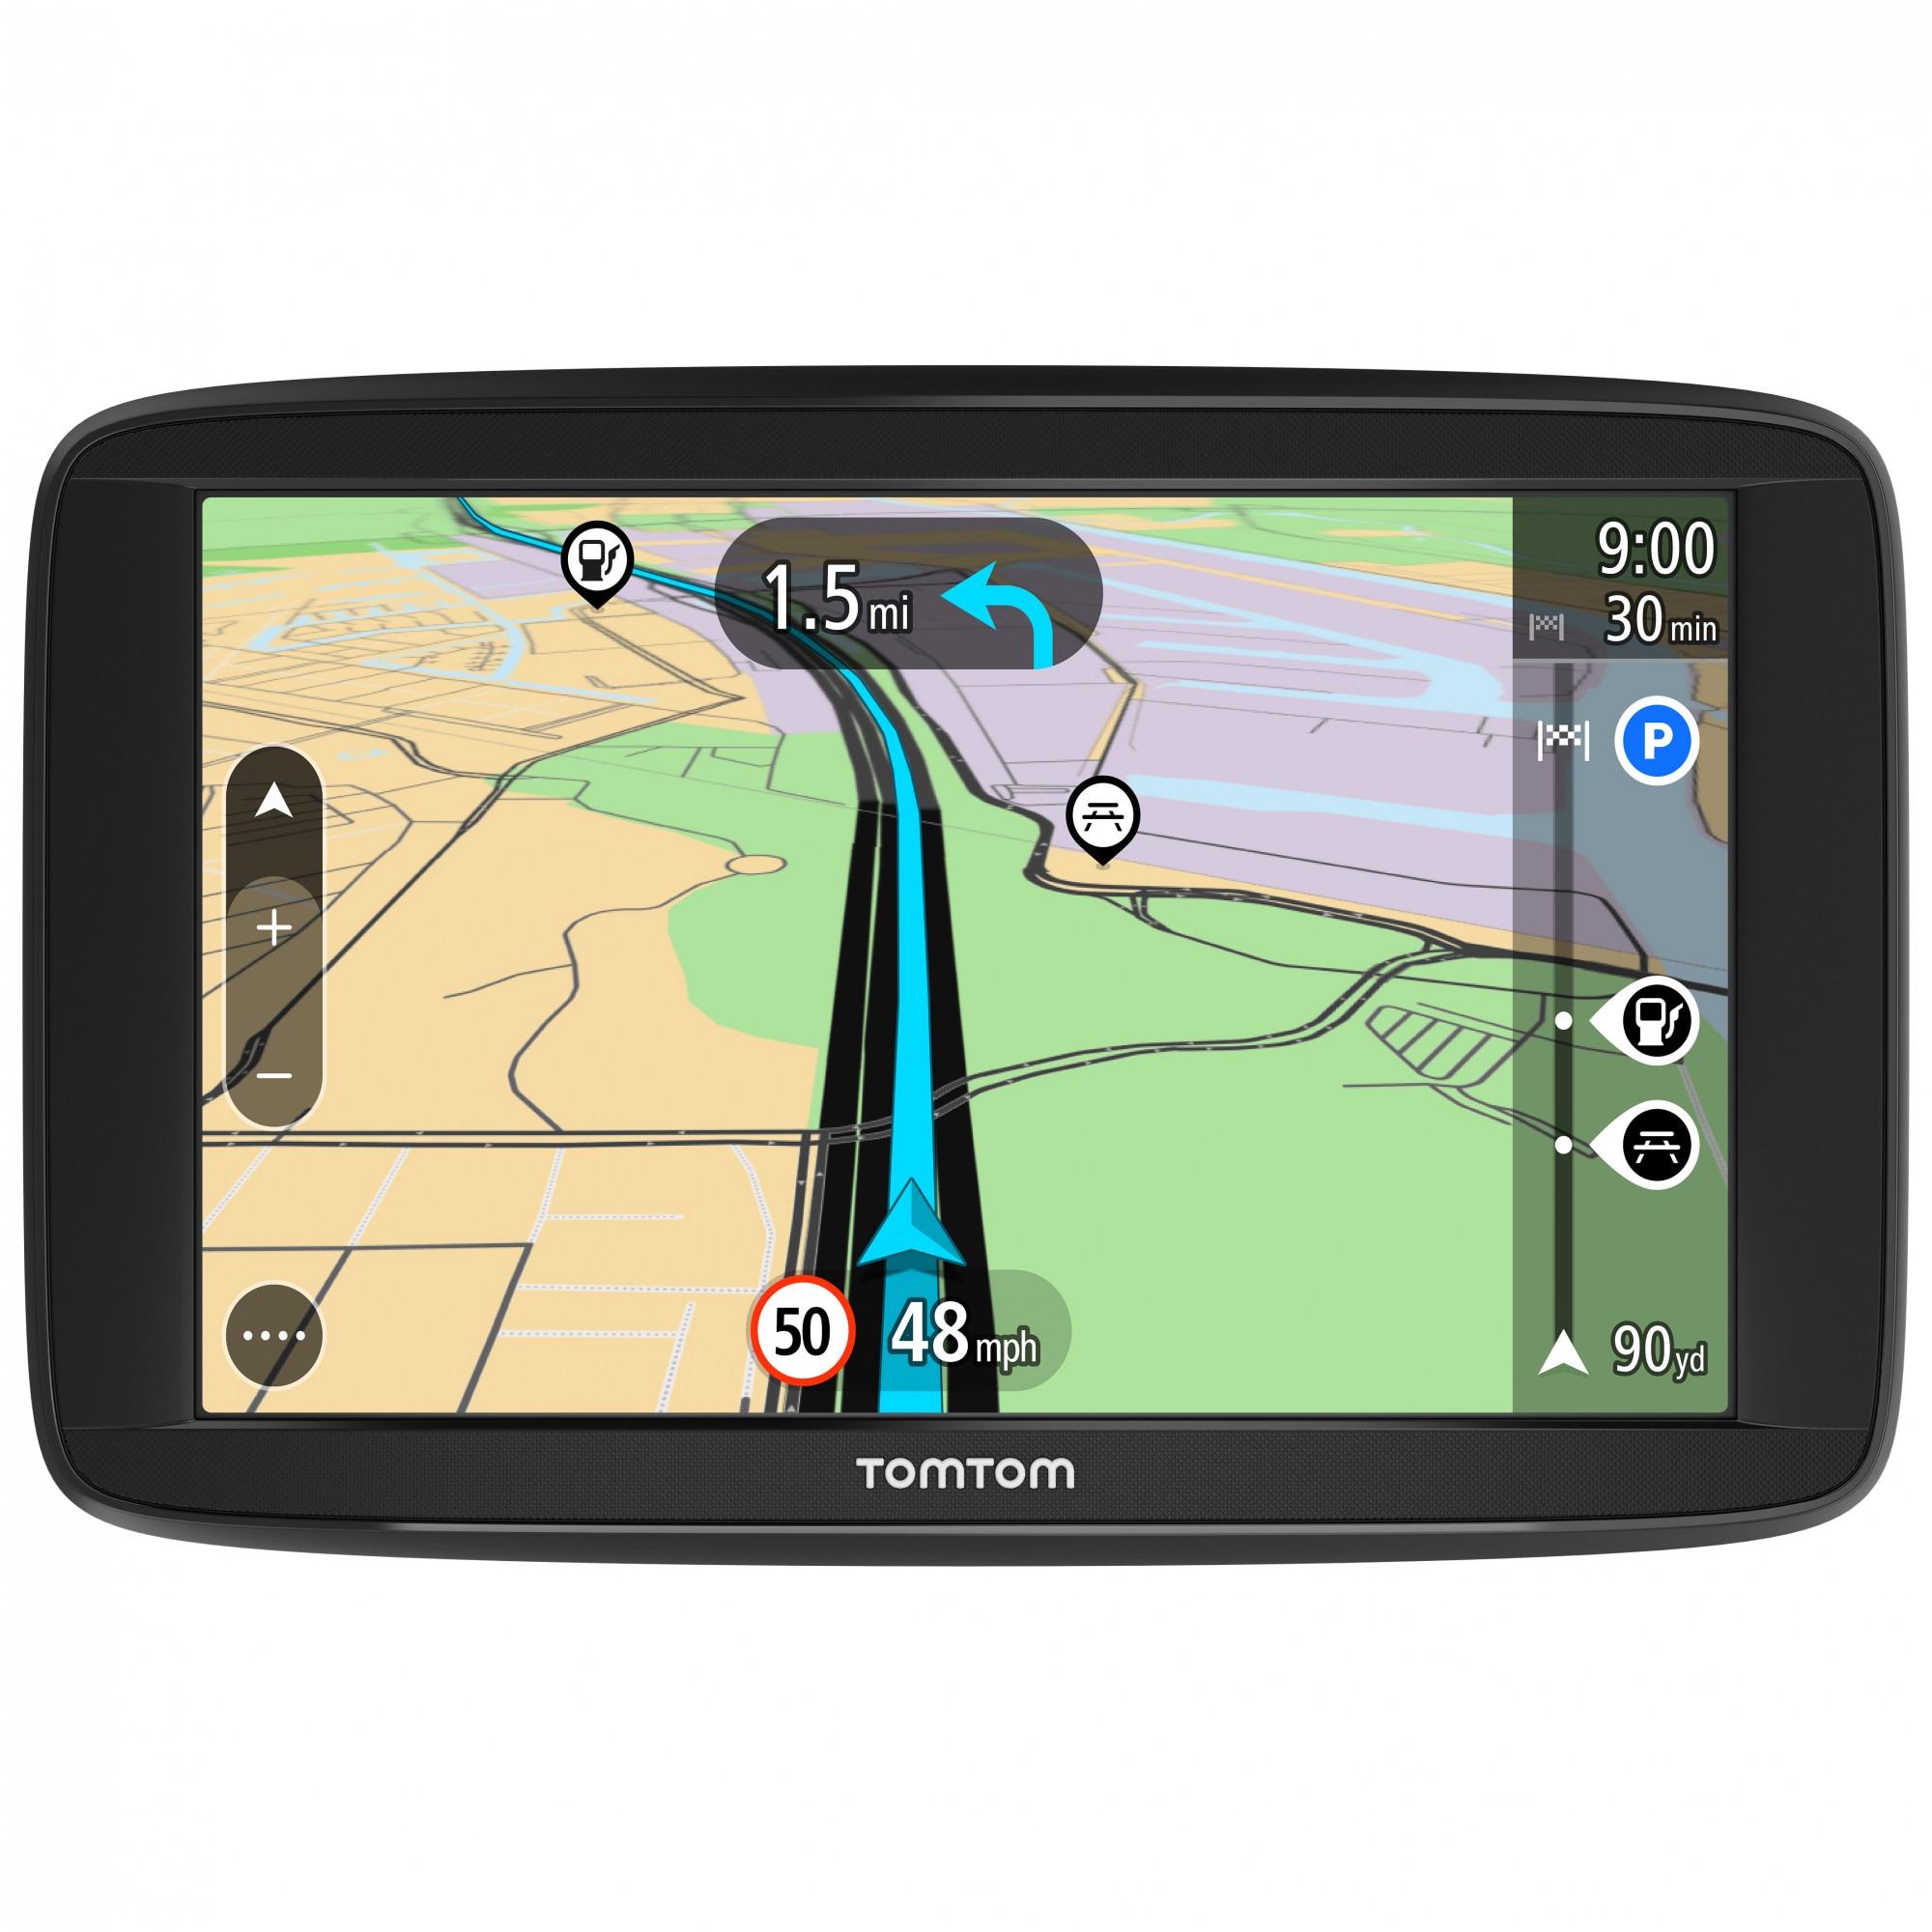 "Fotografie Sistem de navigatie GPS TomTom Start 42, diagonala 4.2"", 8GB, Harta Full Europe Update gratuit al hartilor pe viata"